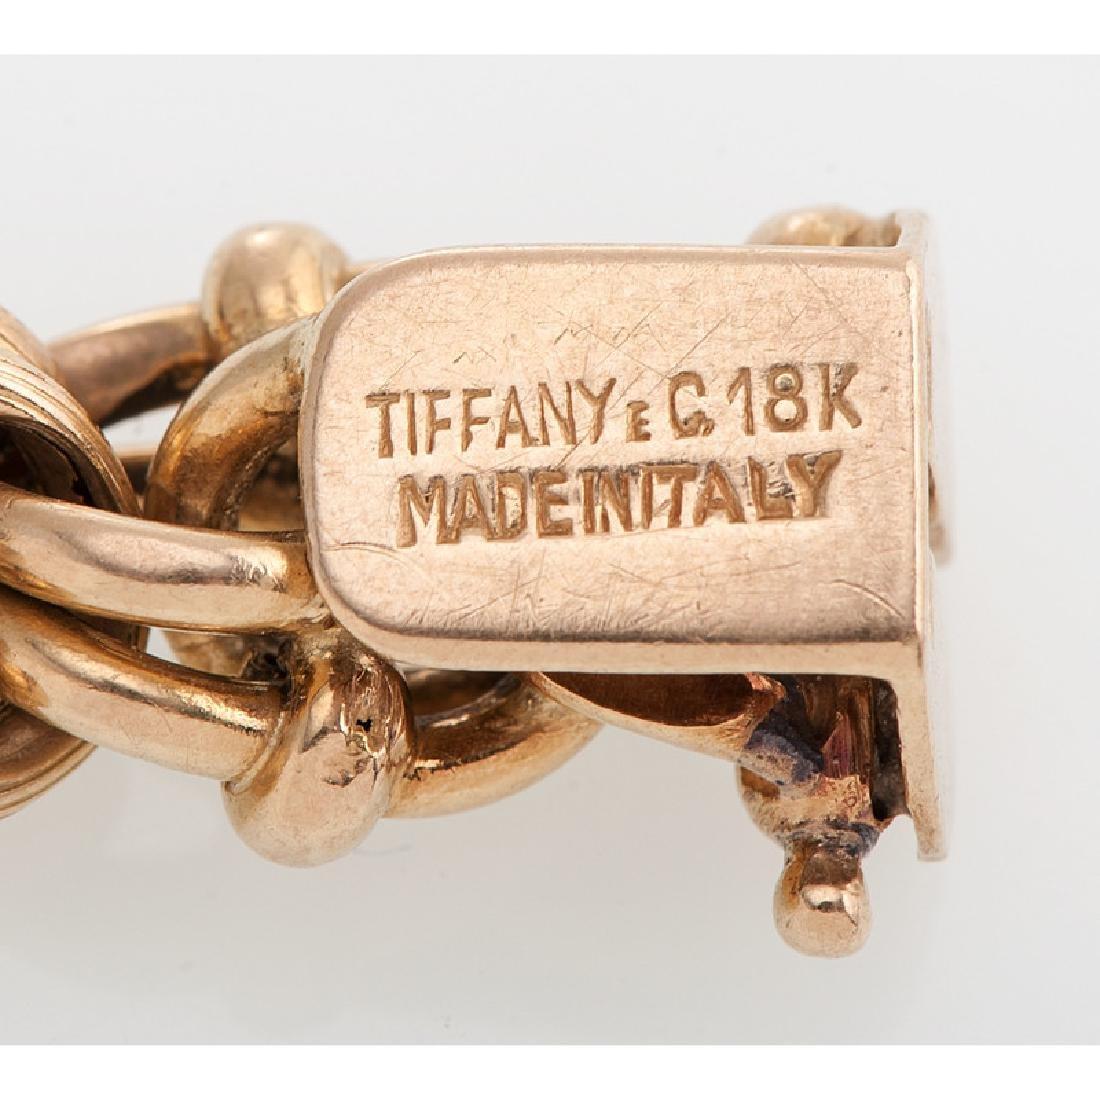 Tiffany & Co. 18 Karat Yellow Gold Bracelet - 4